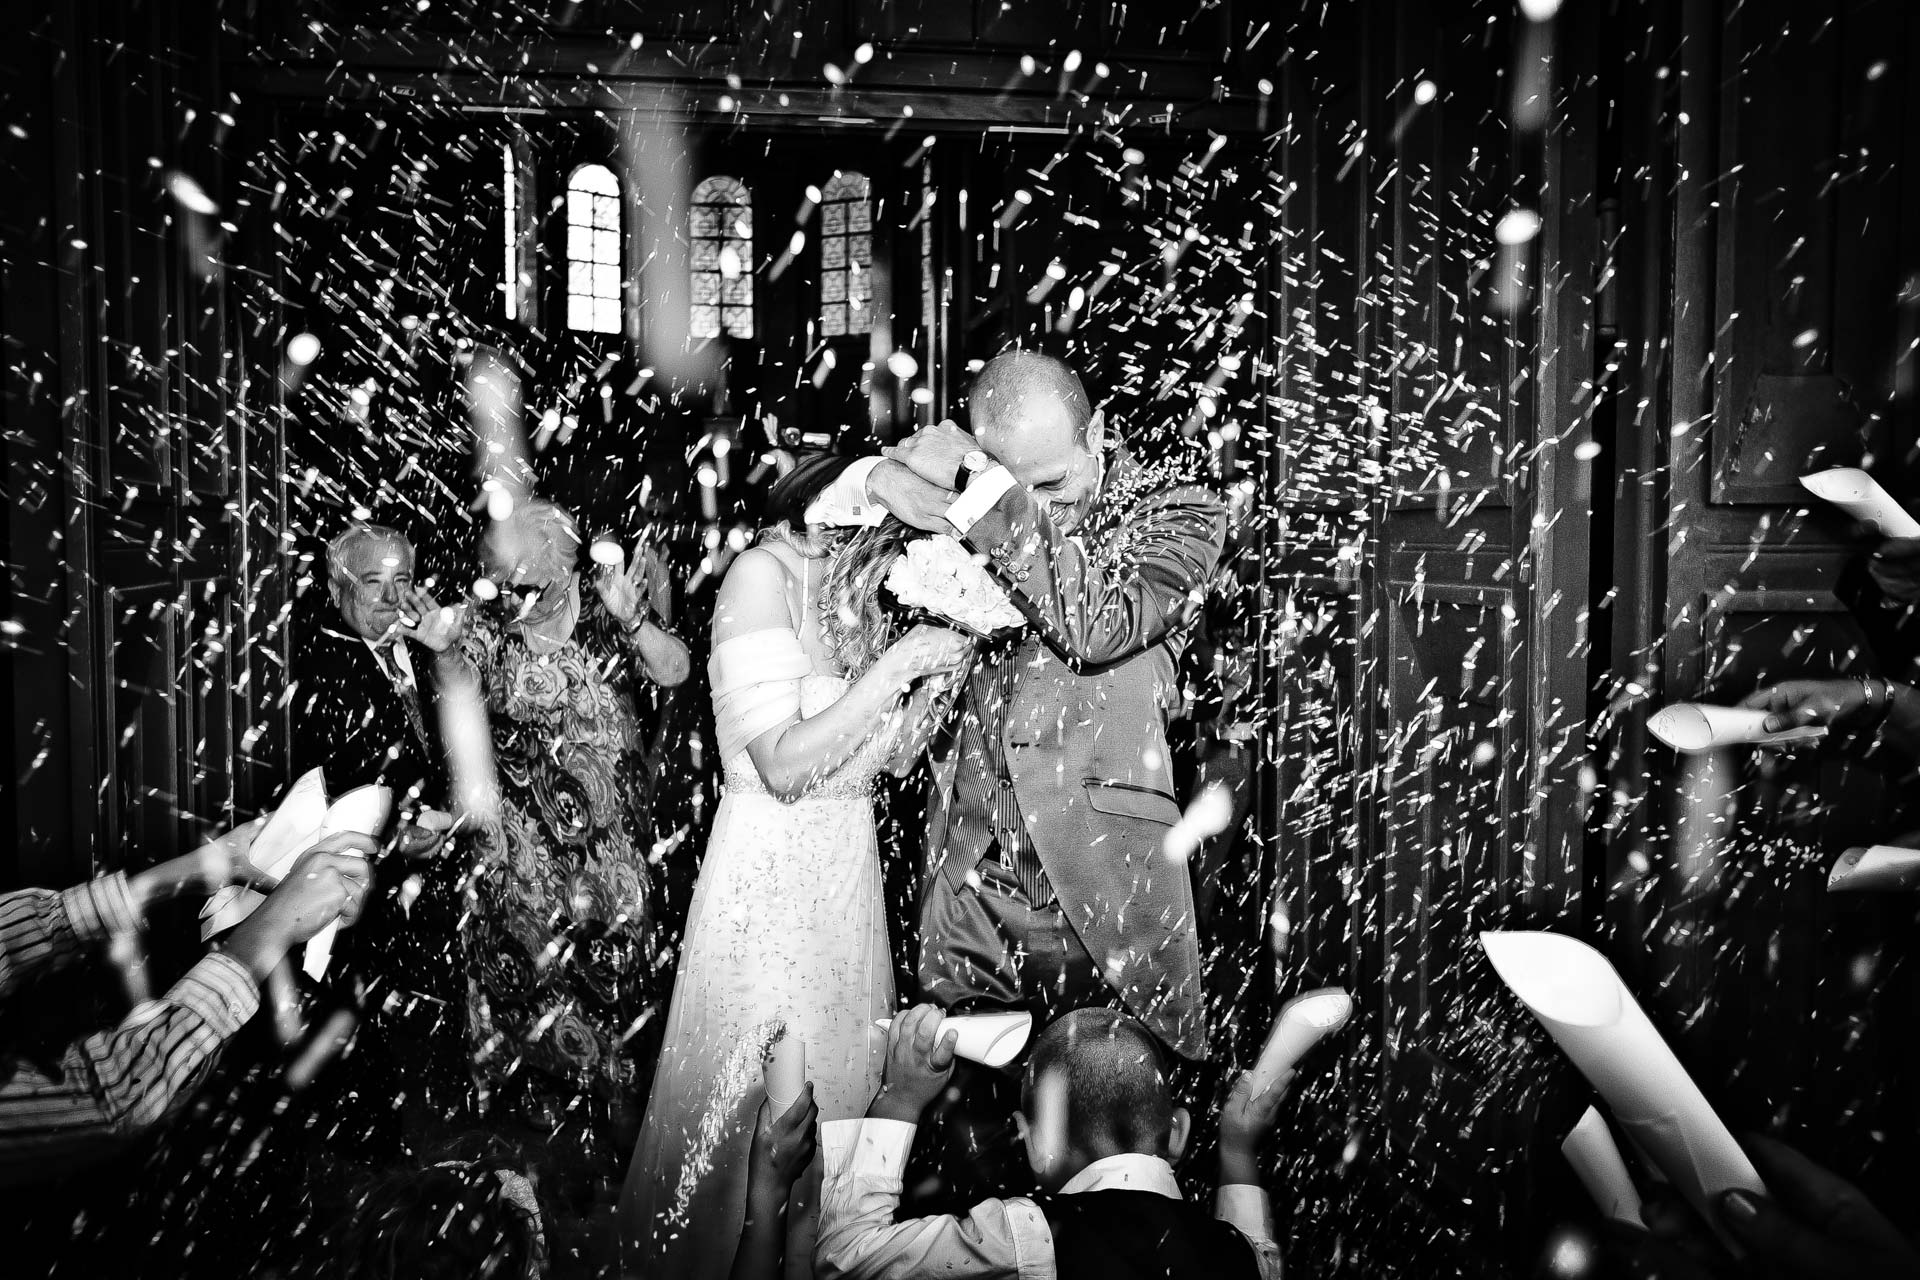 lancio-riso-fotografo-matrimonio-roma